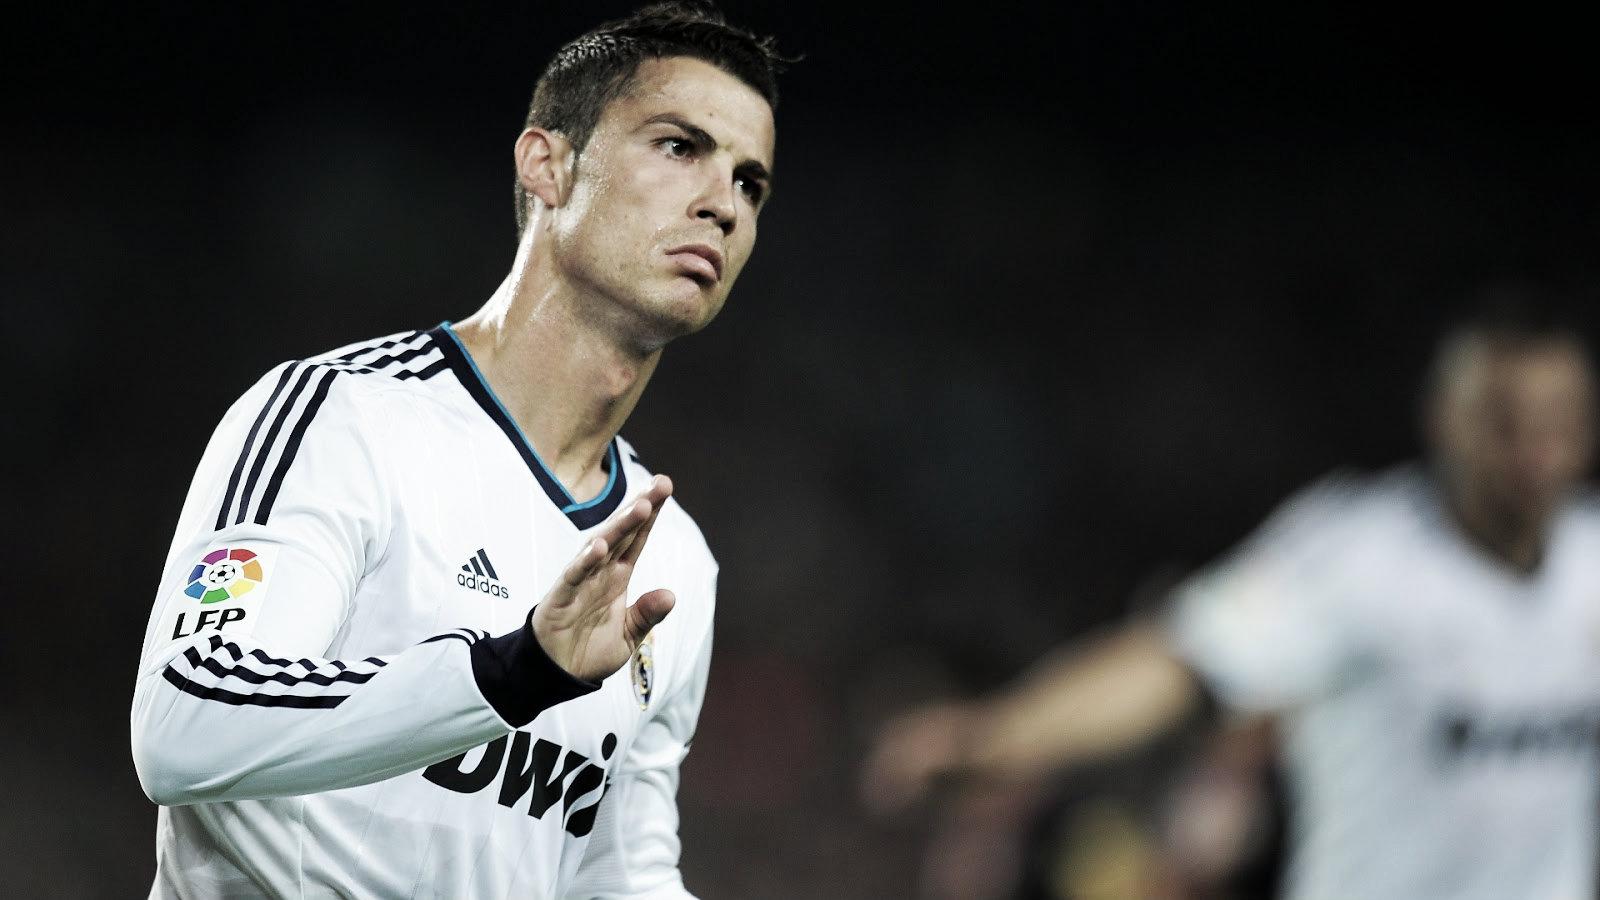 Real Madrid 2012/13: Cristiano Ronaldo